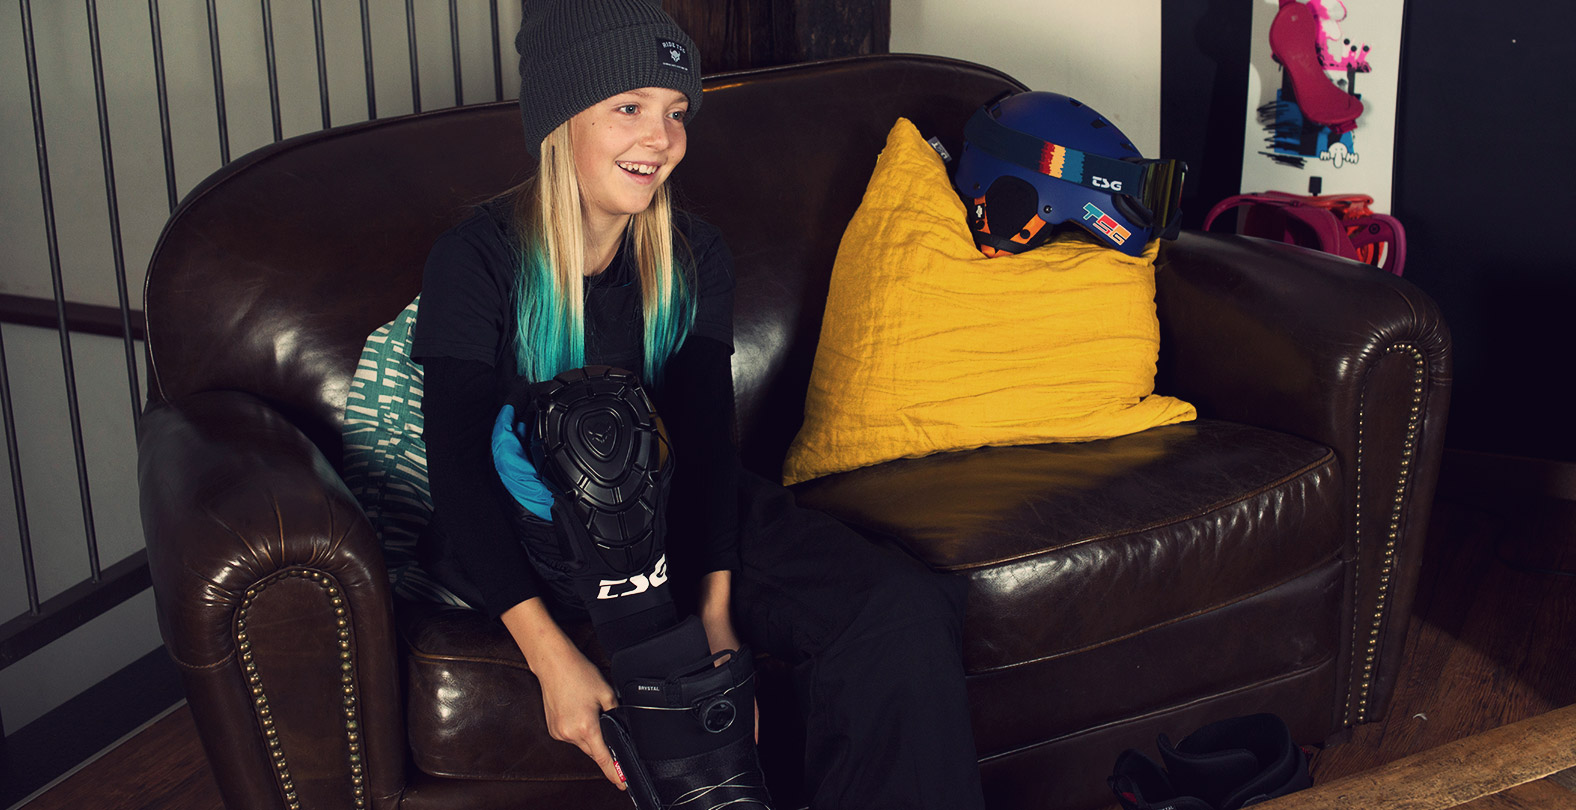 snowboard girl Kona Ettel putting on TSG knee guards